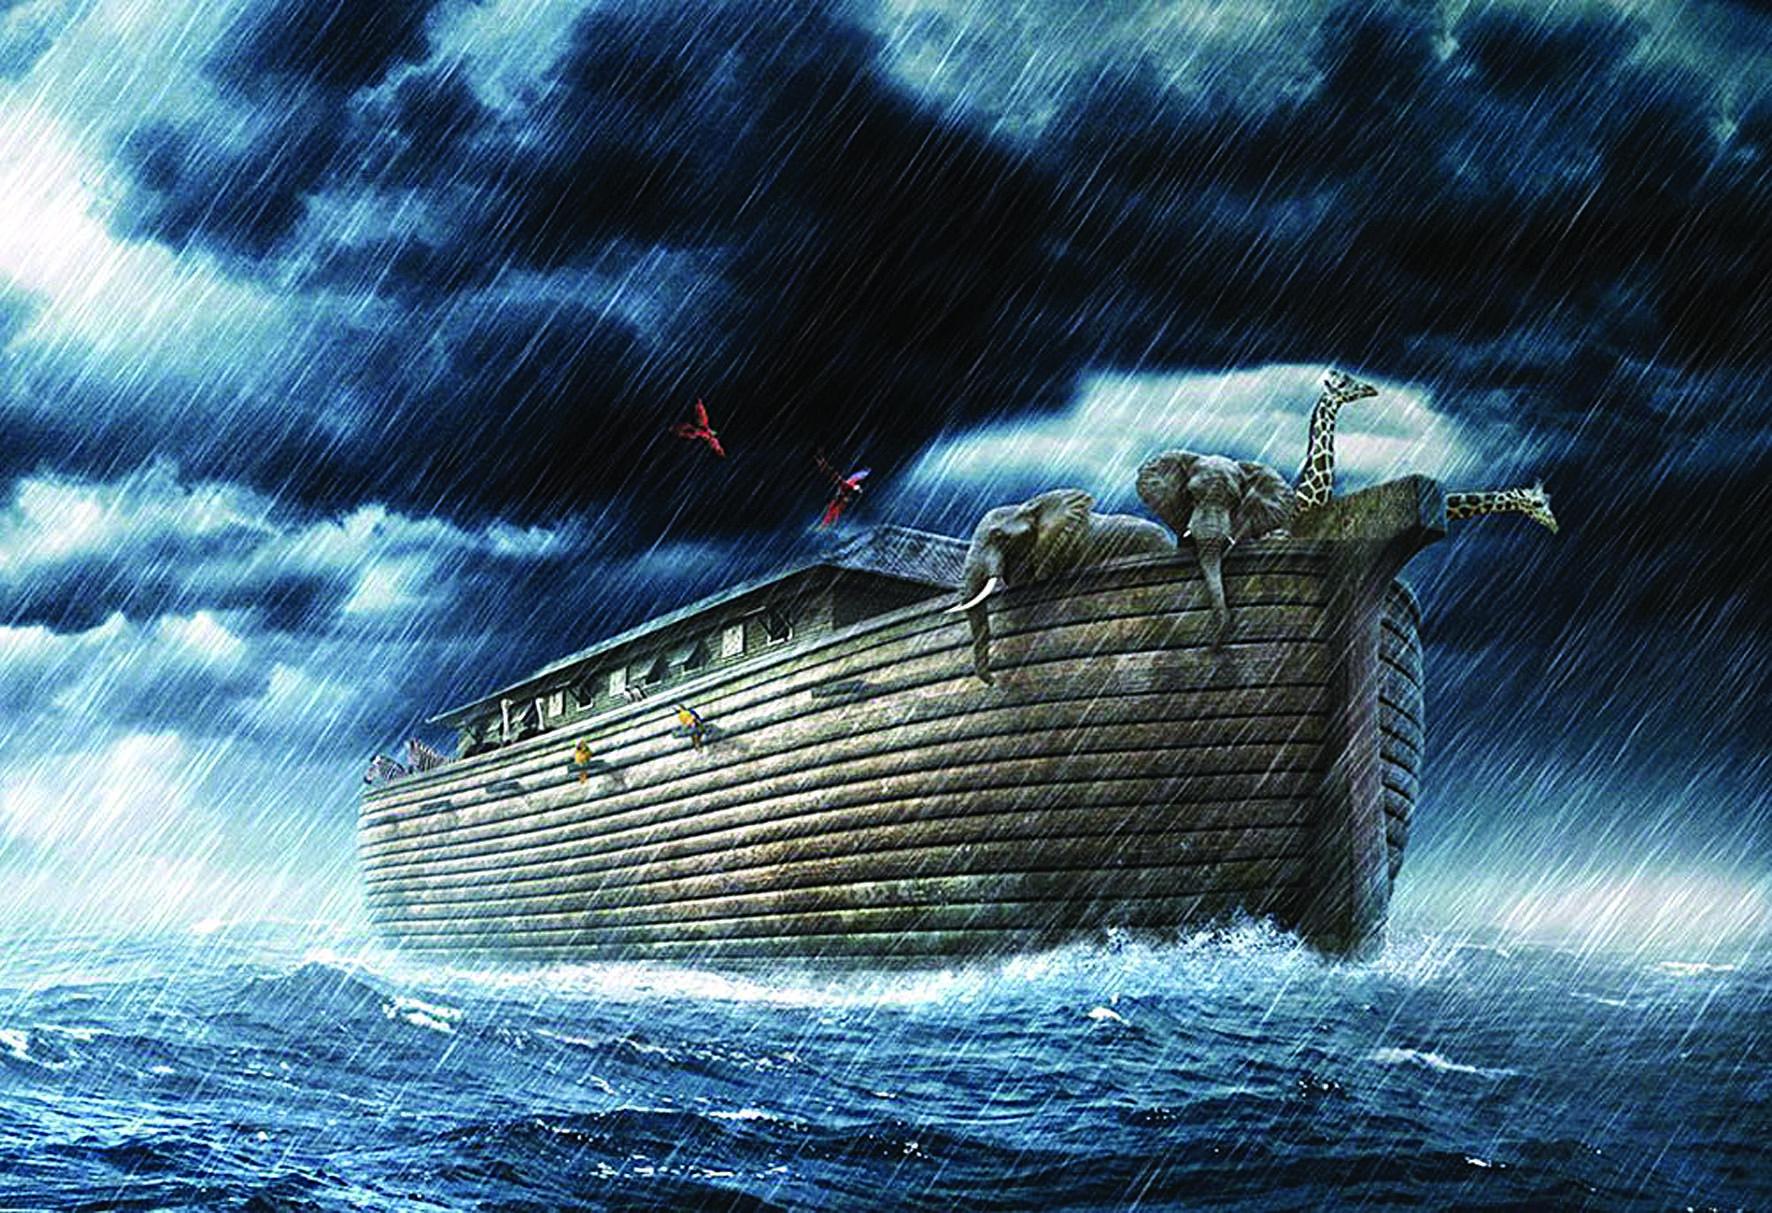 12 noahs-ark-3